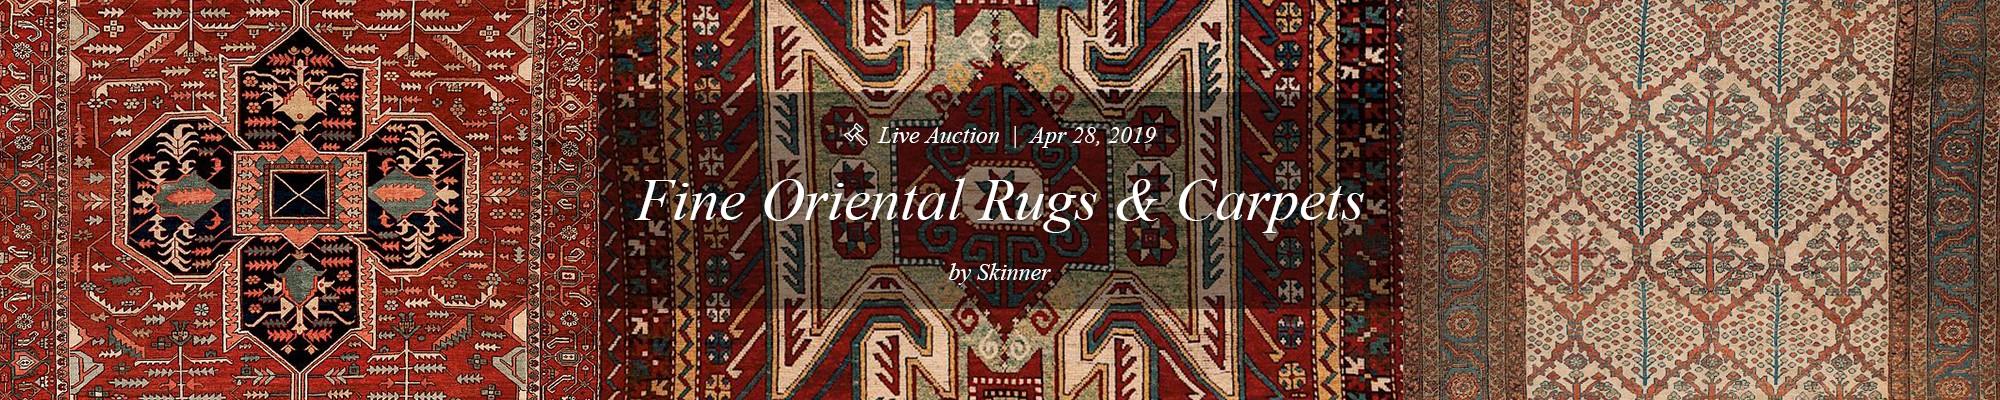 fine-oriental-rugs-carpets-skinner